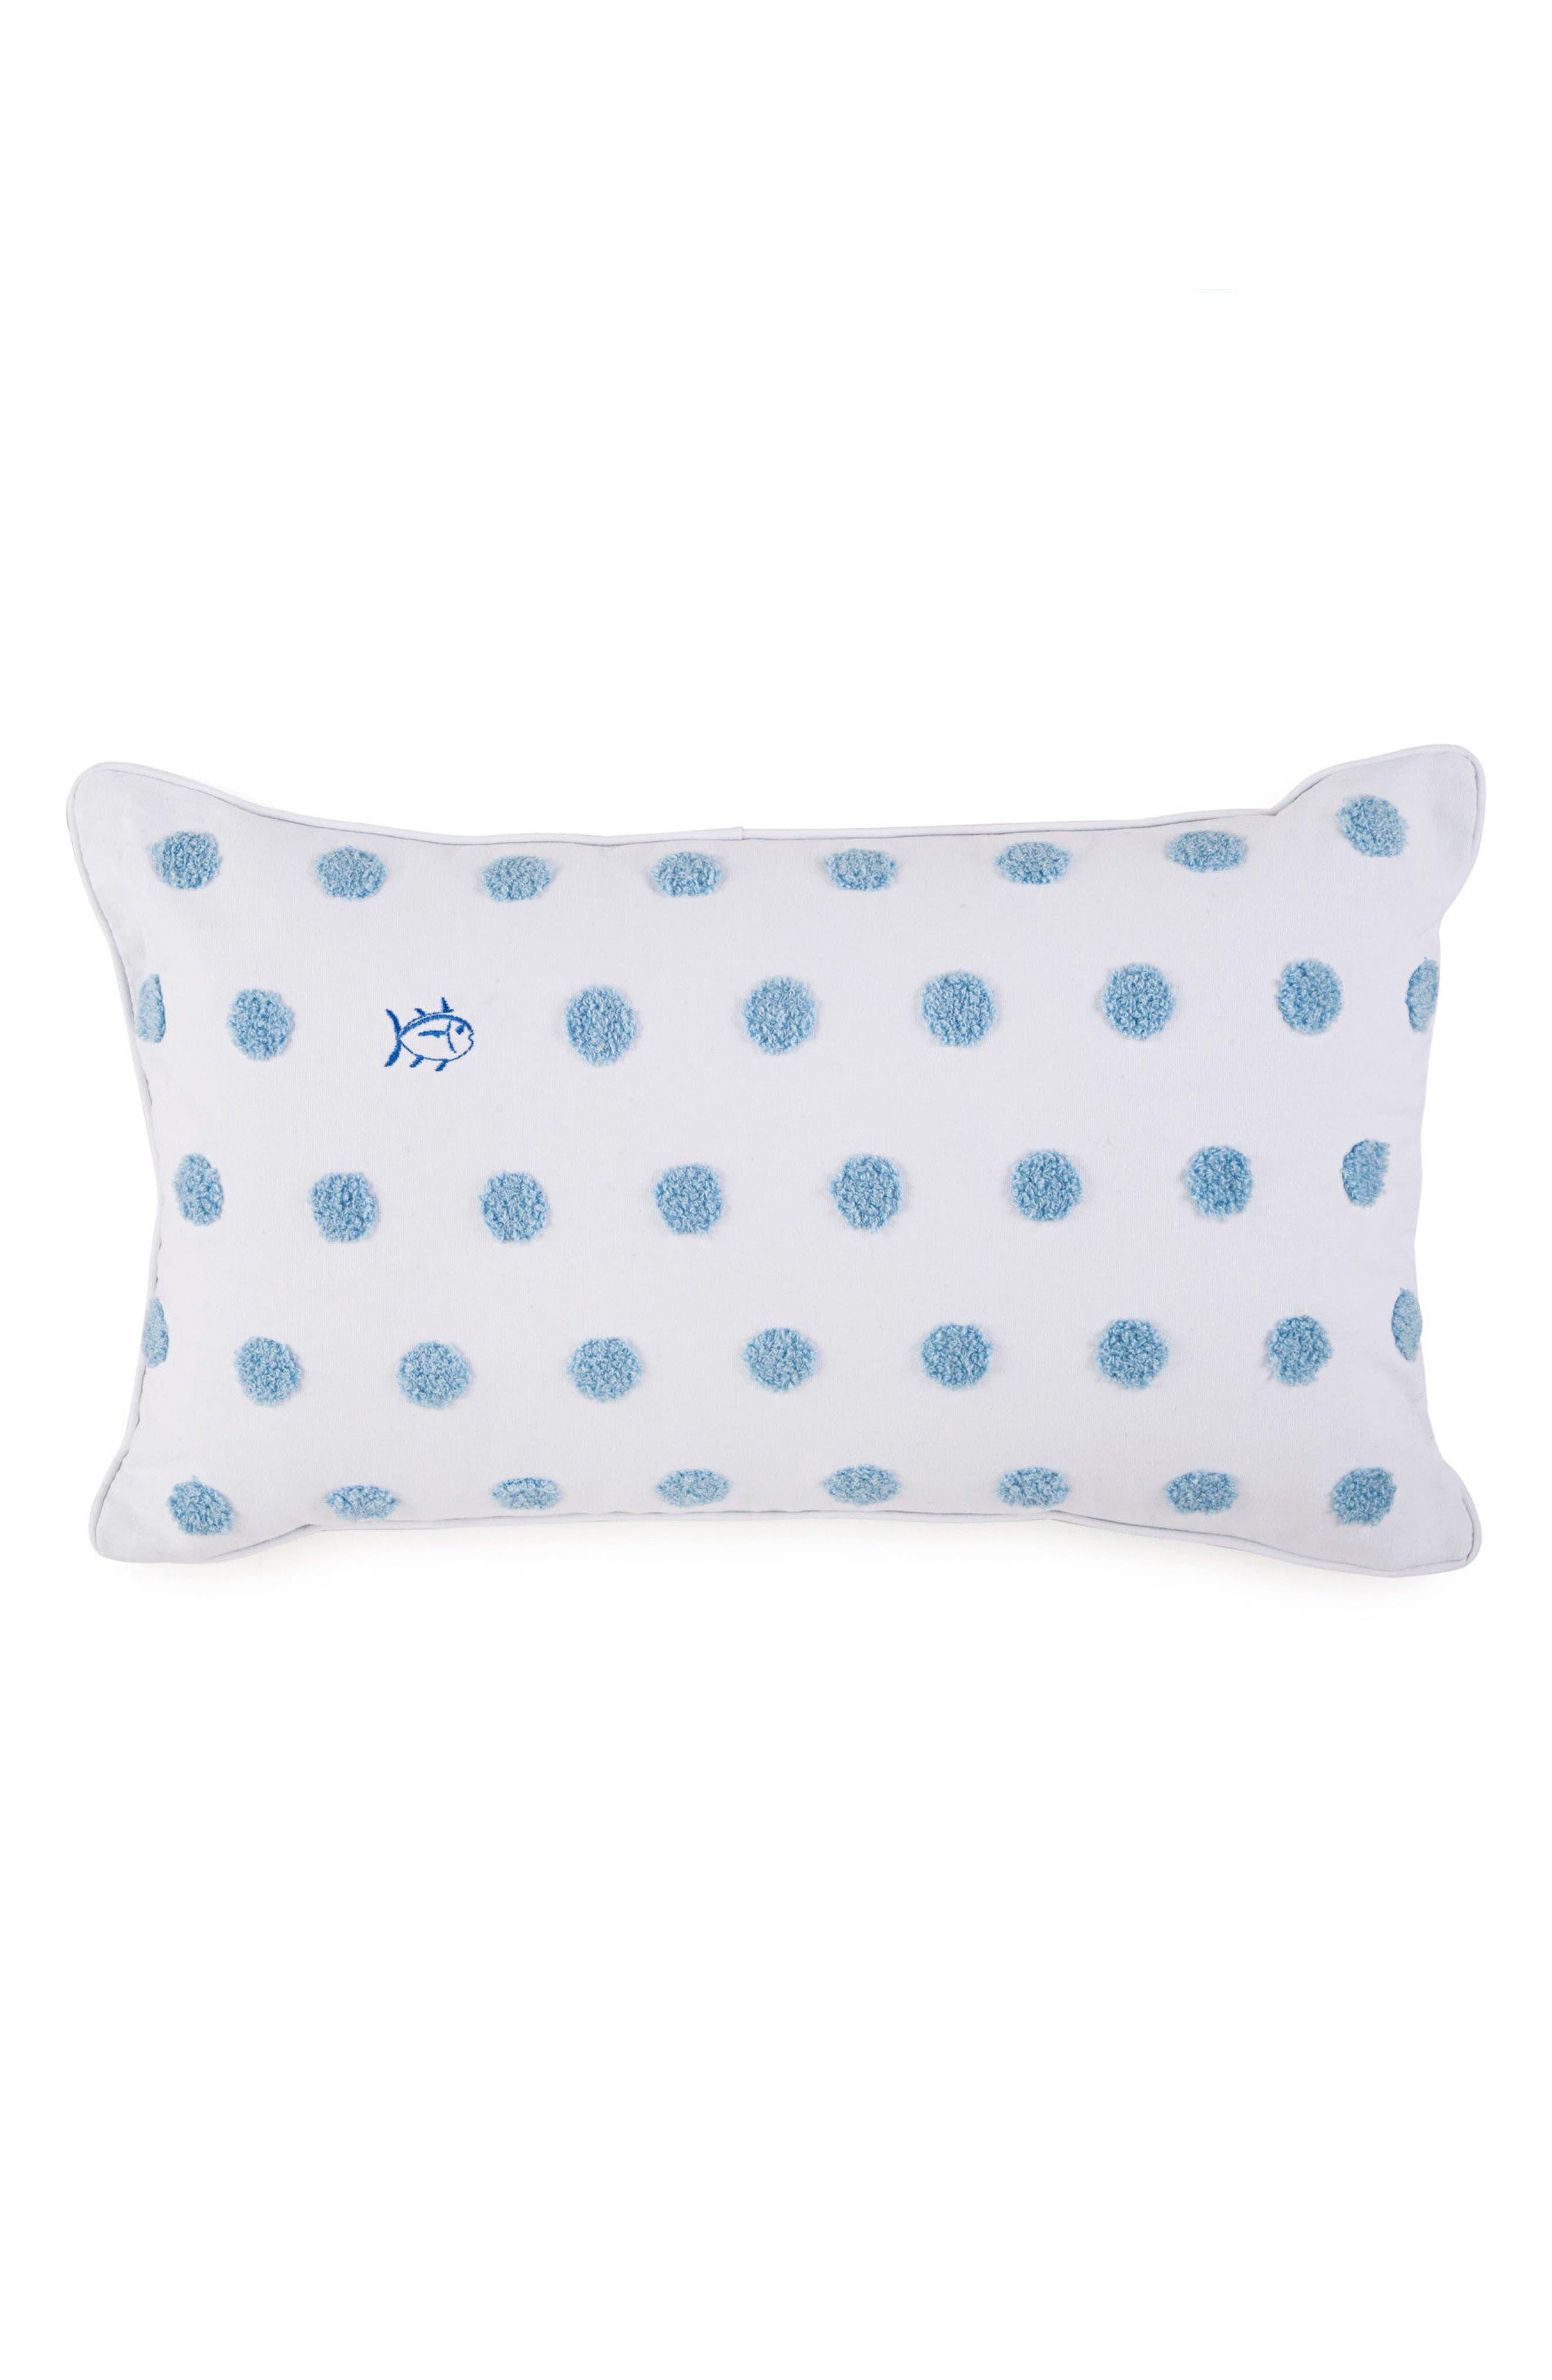 Summer Daze Bouclé Rectangular Accent Pillow,                             Main thumbnail 1, color,                             White